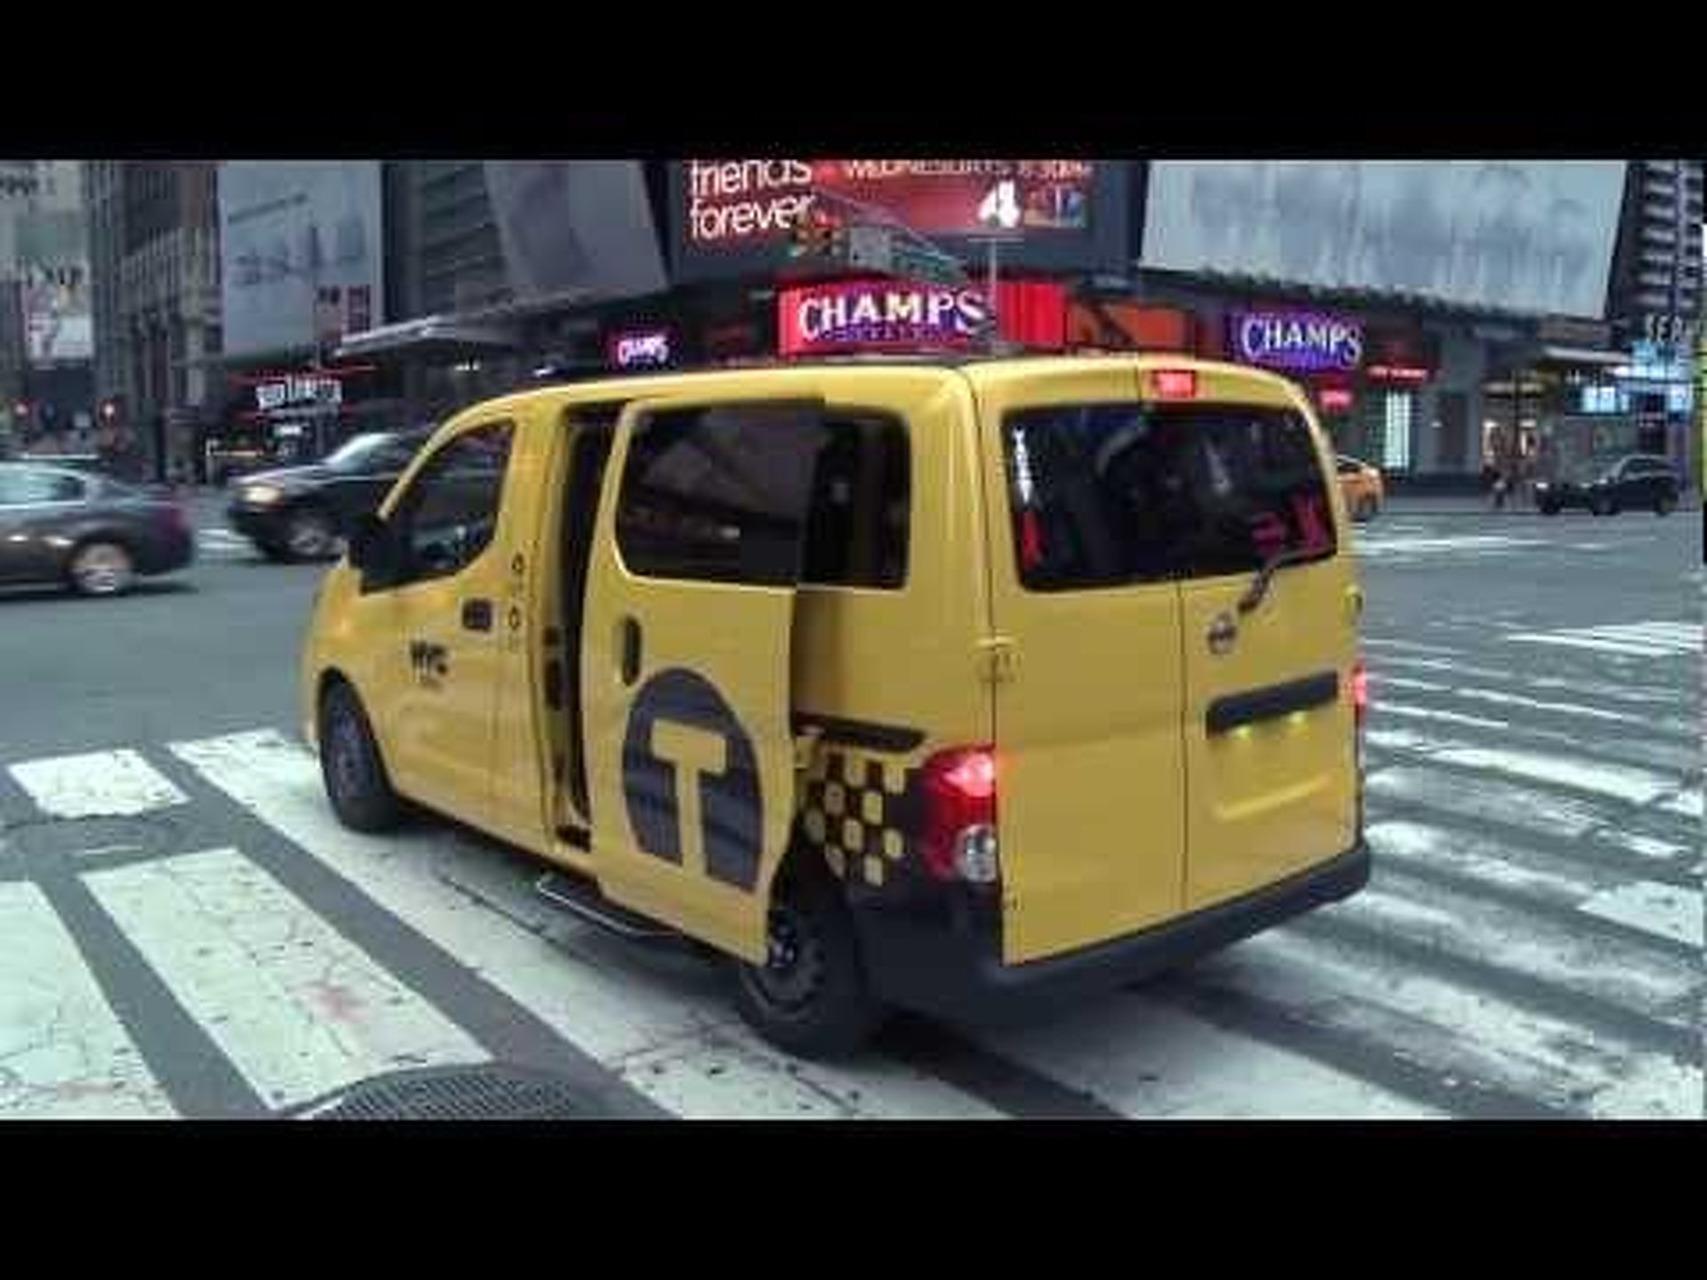 2014 Nissan NV200 Taxi of Tomorrow